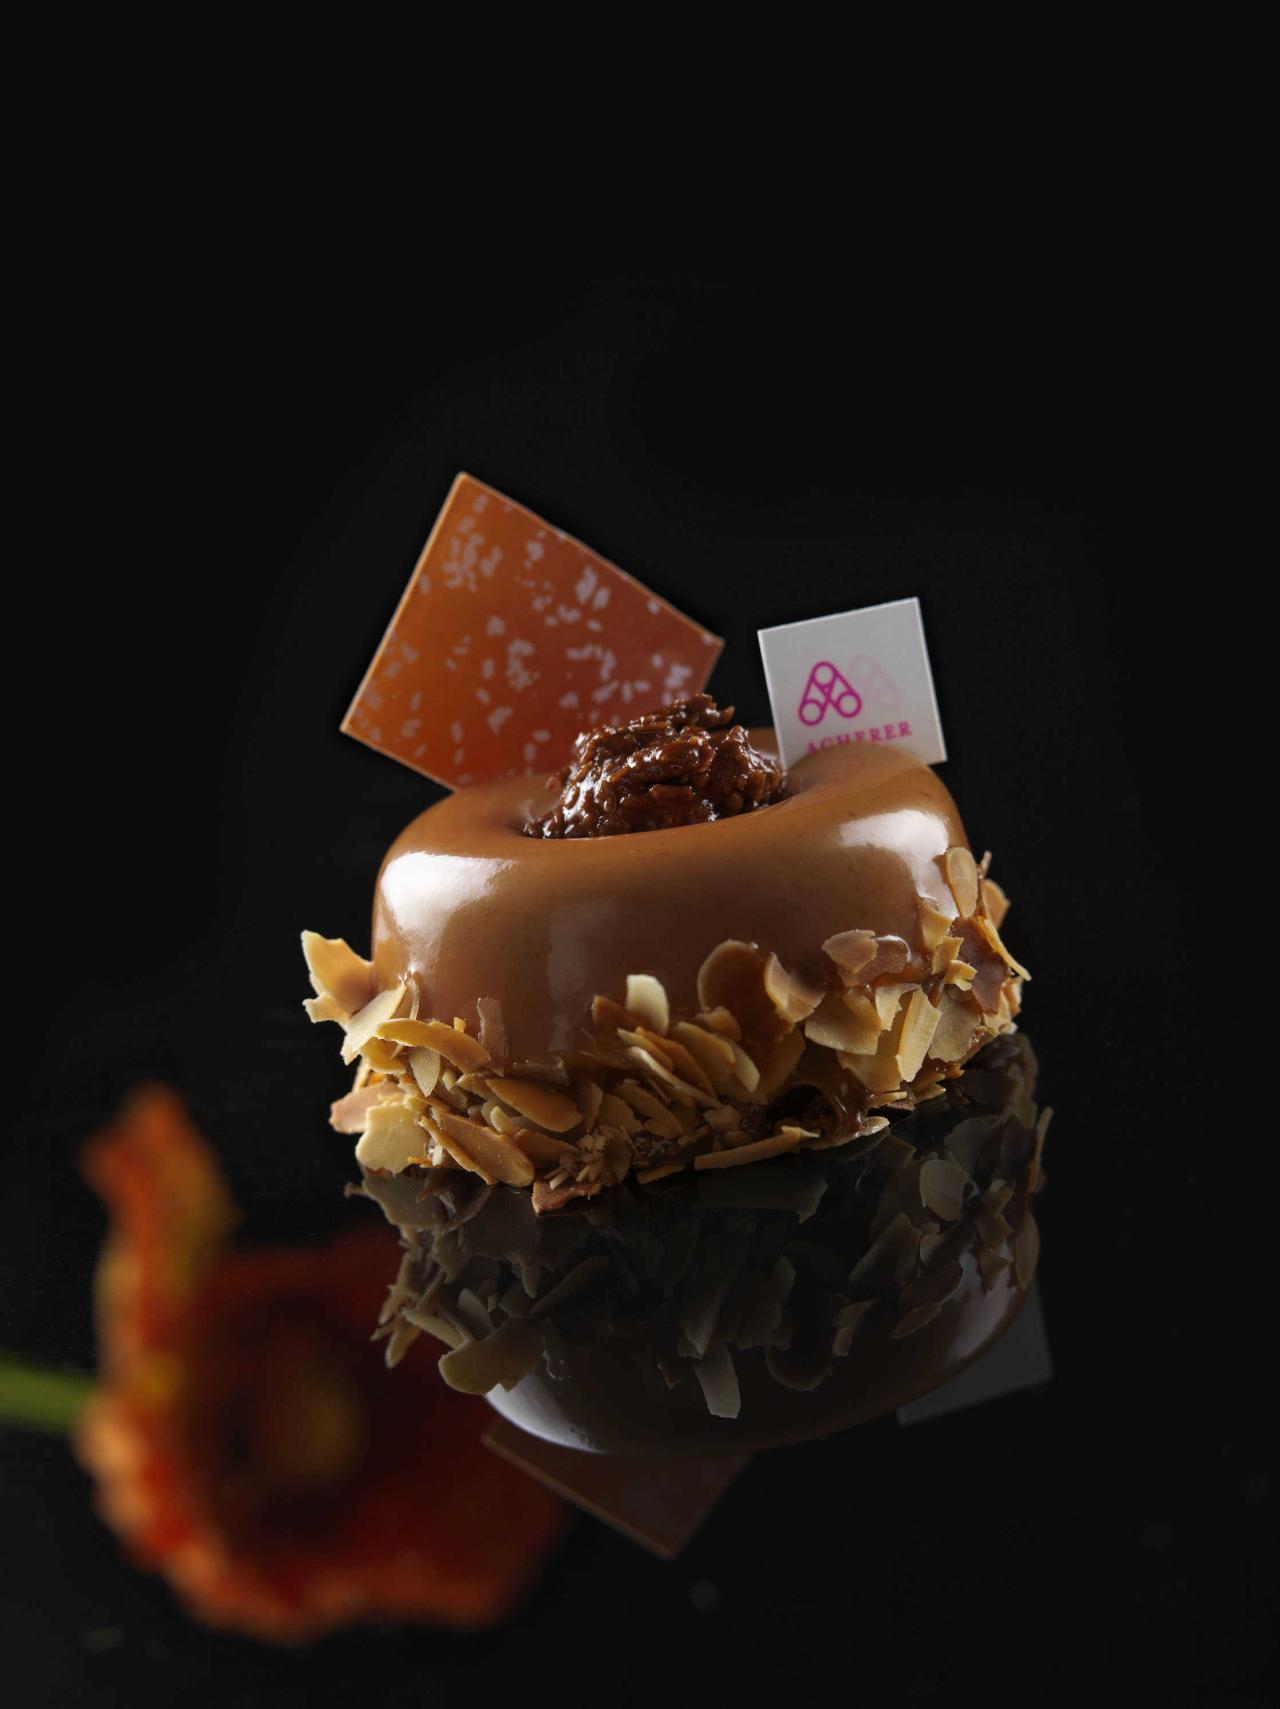 Chocolate dessert by Andreas Acherer